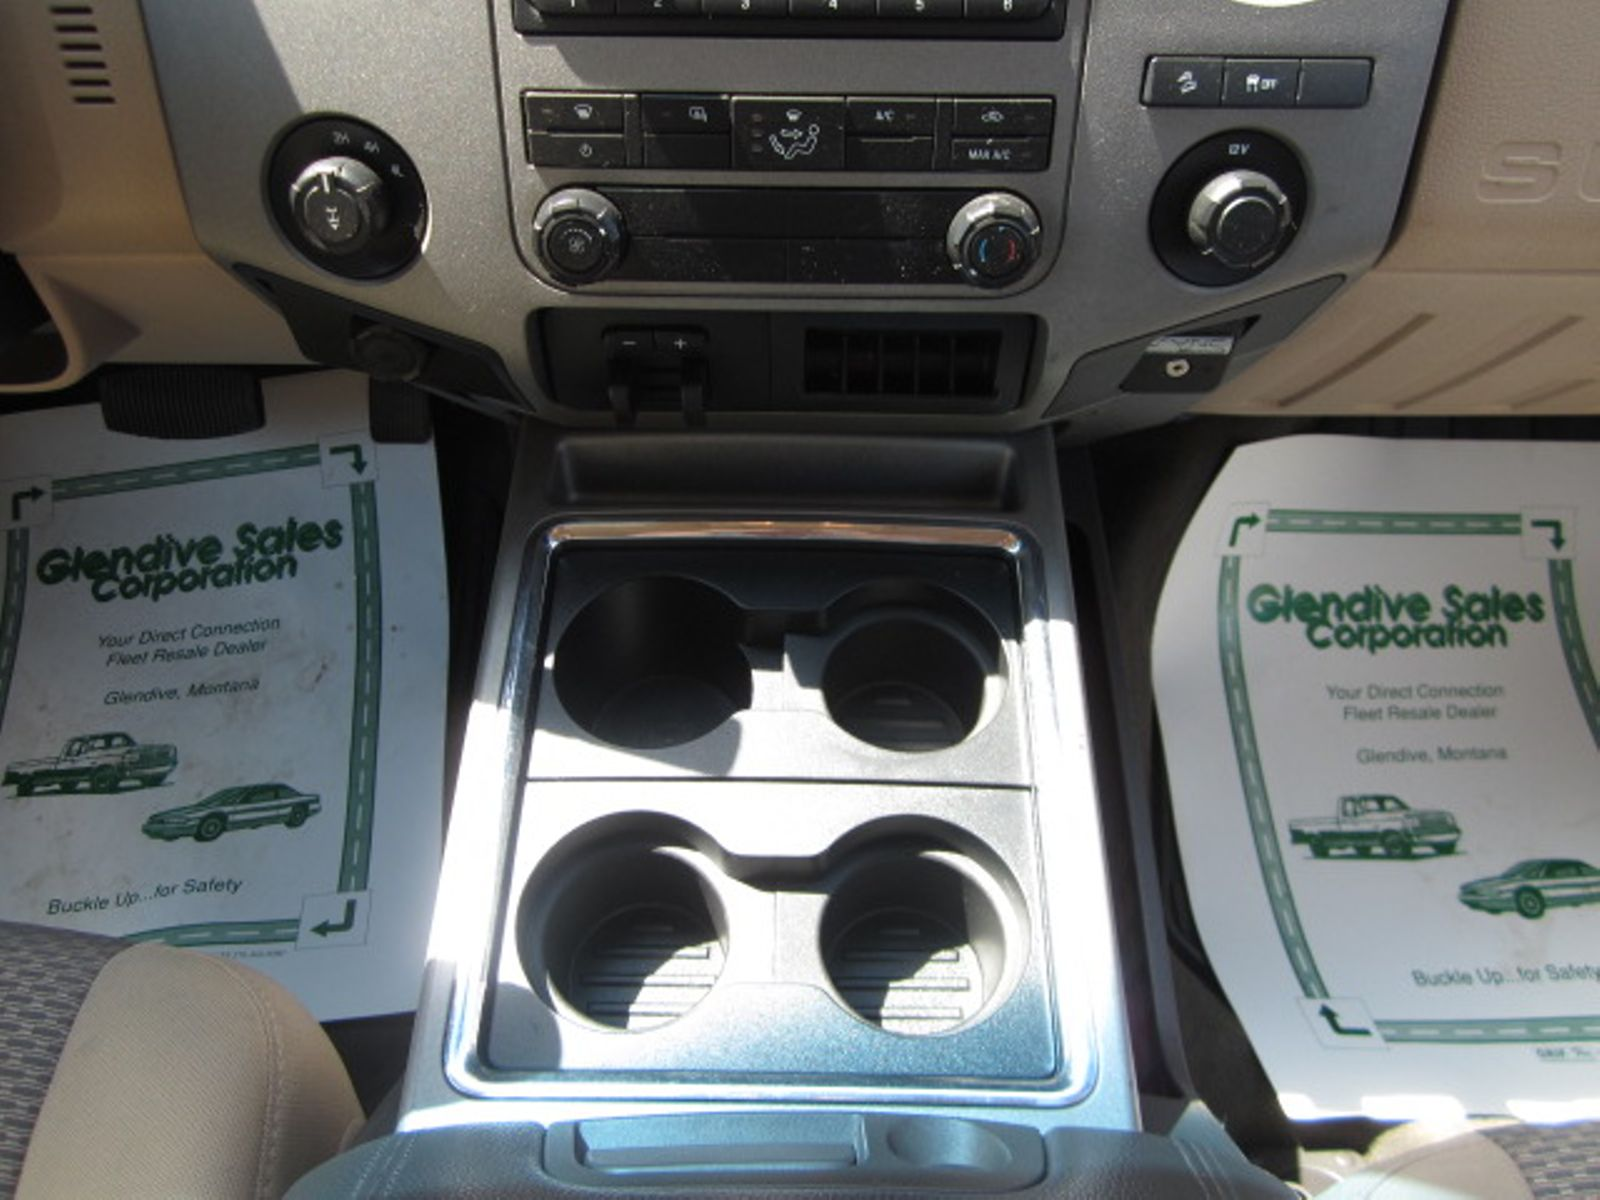 medium resolution of  2011 ford super duty f 350 srw pickup xlt glendive mt glendive sales corp in